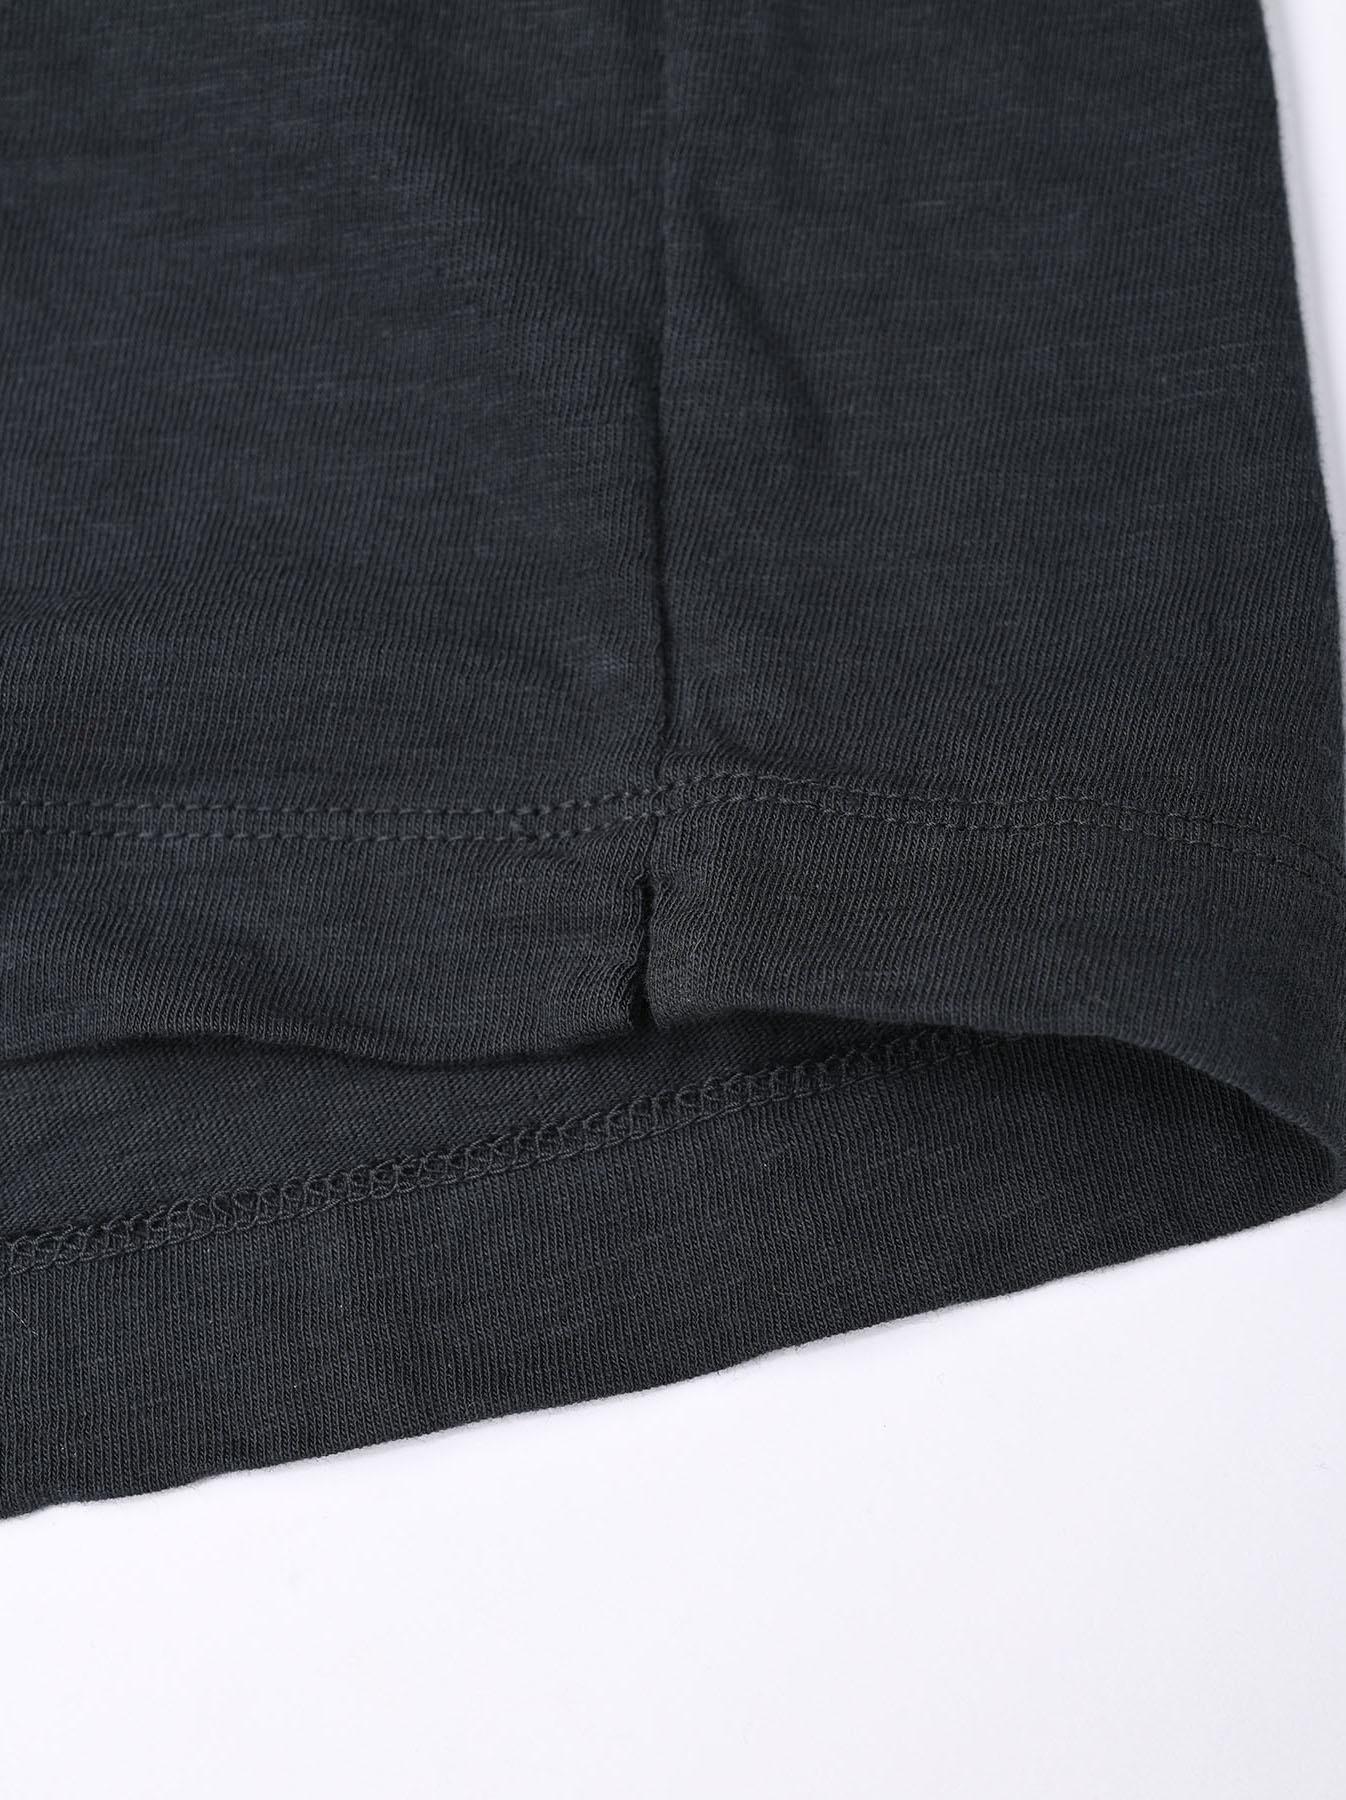 Zimbabwe Cotton Ocean Long-sleeved T-shirt-10